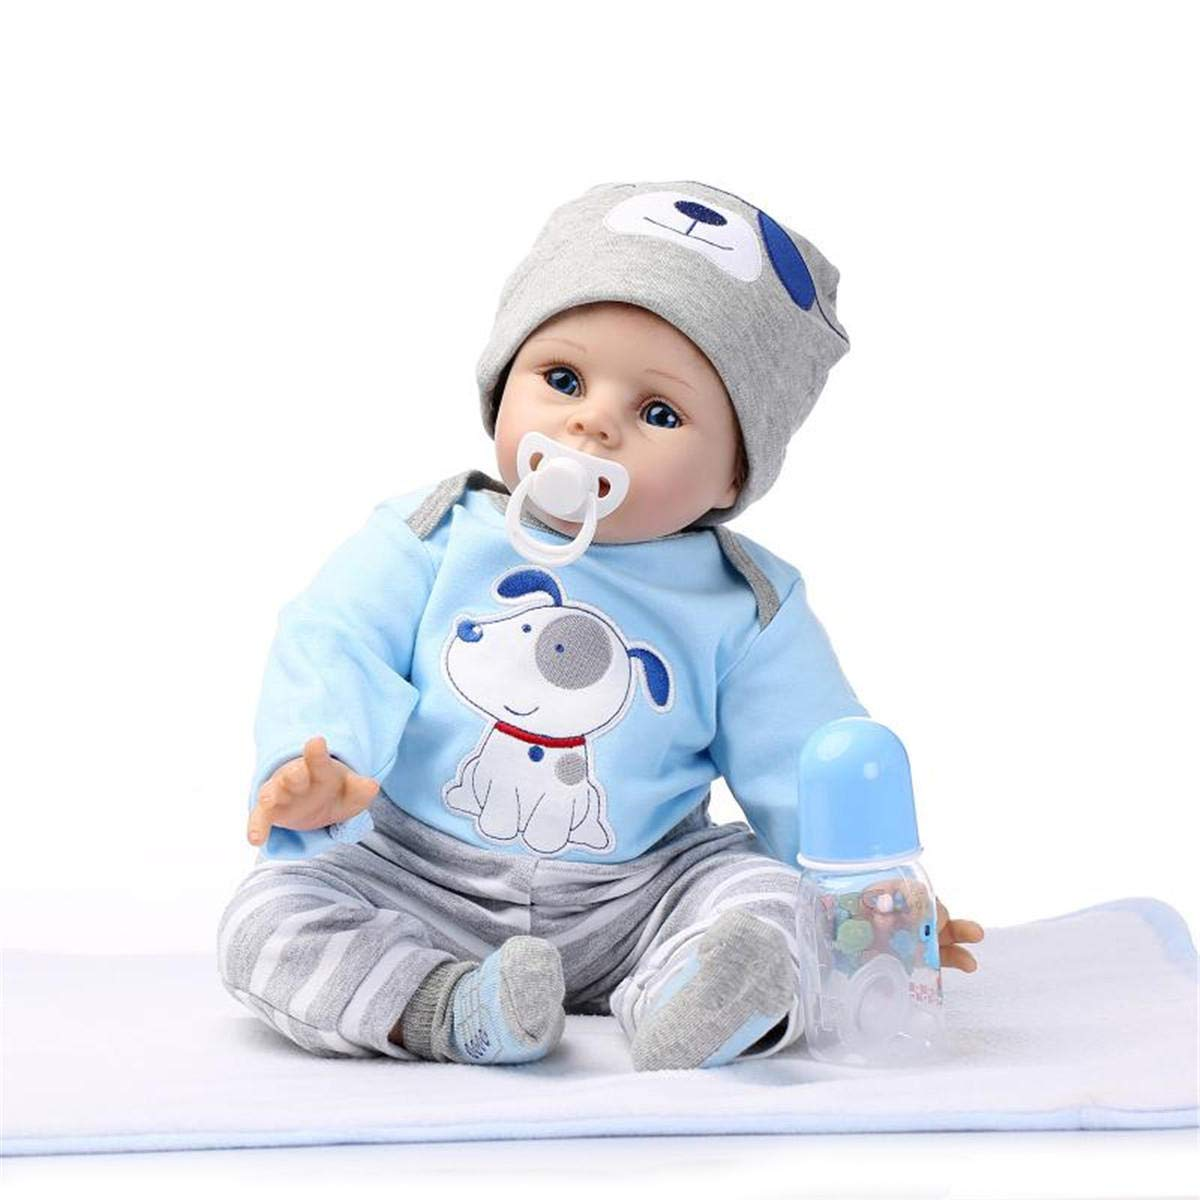 Global Brands Online NPK Puppe 22 '' '' '' Reborn Silikon handgemachte lebensechte Babypuppen realistische Neugeborenen Spielzeug 45dad9